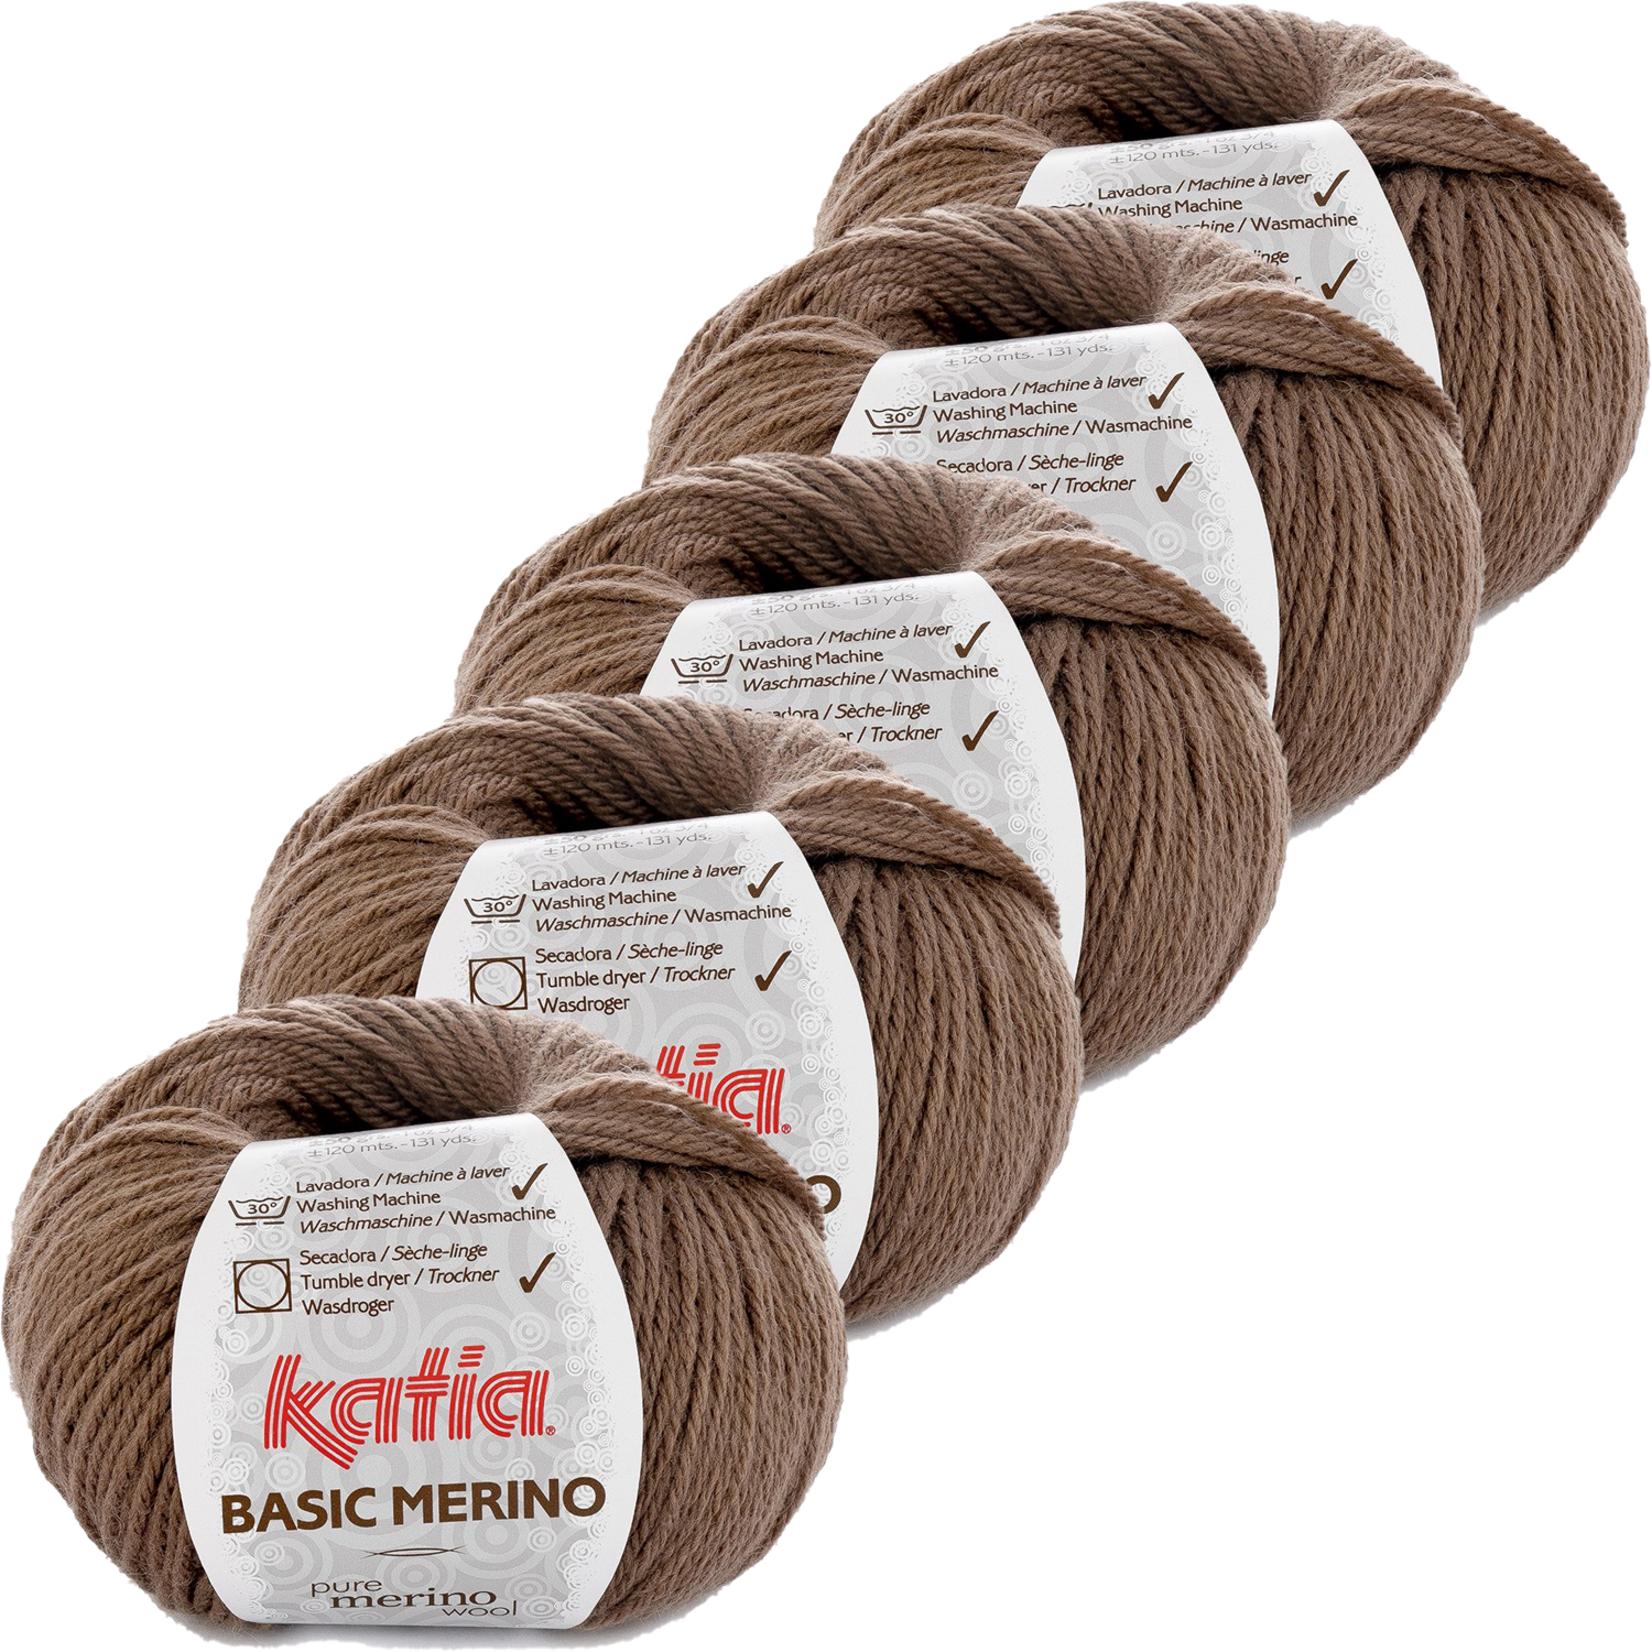 Katia Basic Merino - kleur 68_Reebruin - bundel 5 bollen 50 gr.  van 120 m.